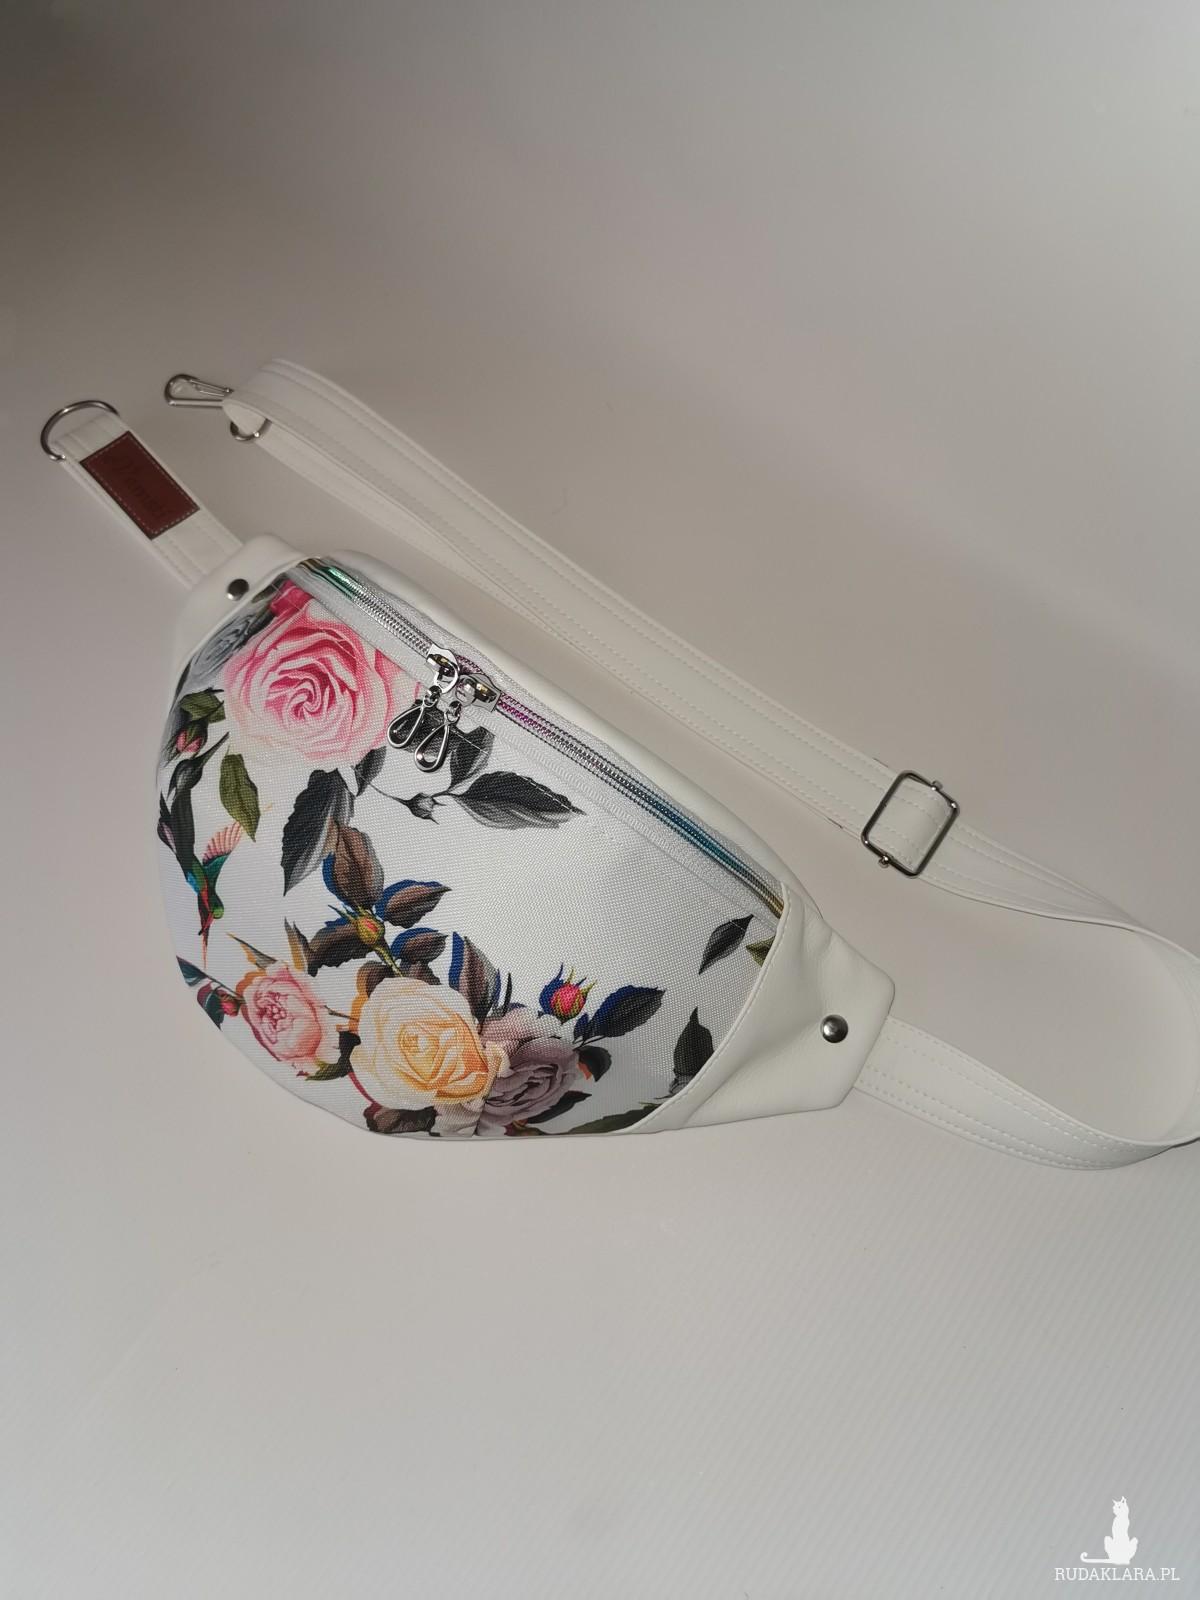 Nerka saszetka biodrowa wodoodporna handmade torebka na pas torebka na ramię mini torebka ekoskóra w róże